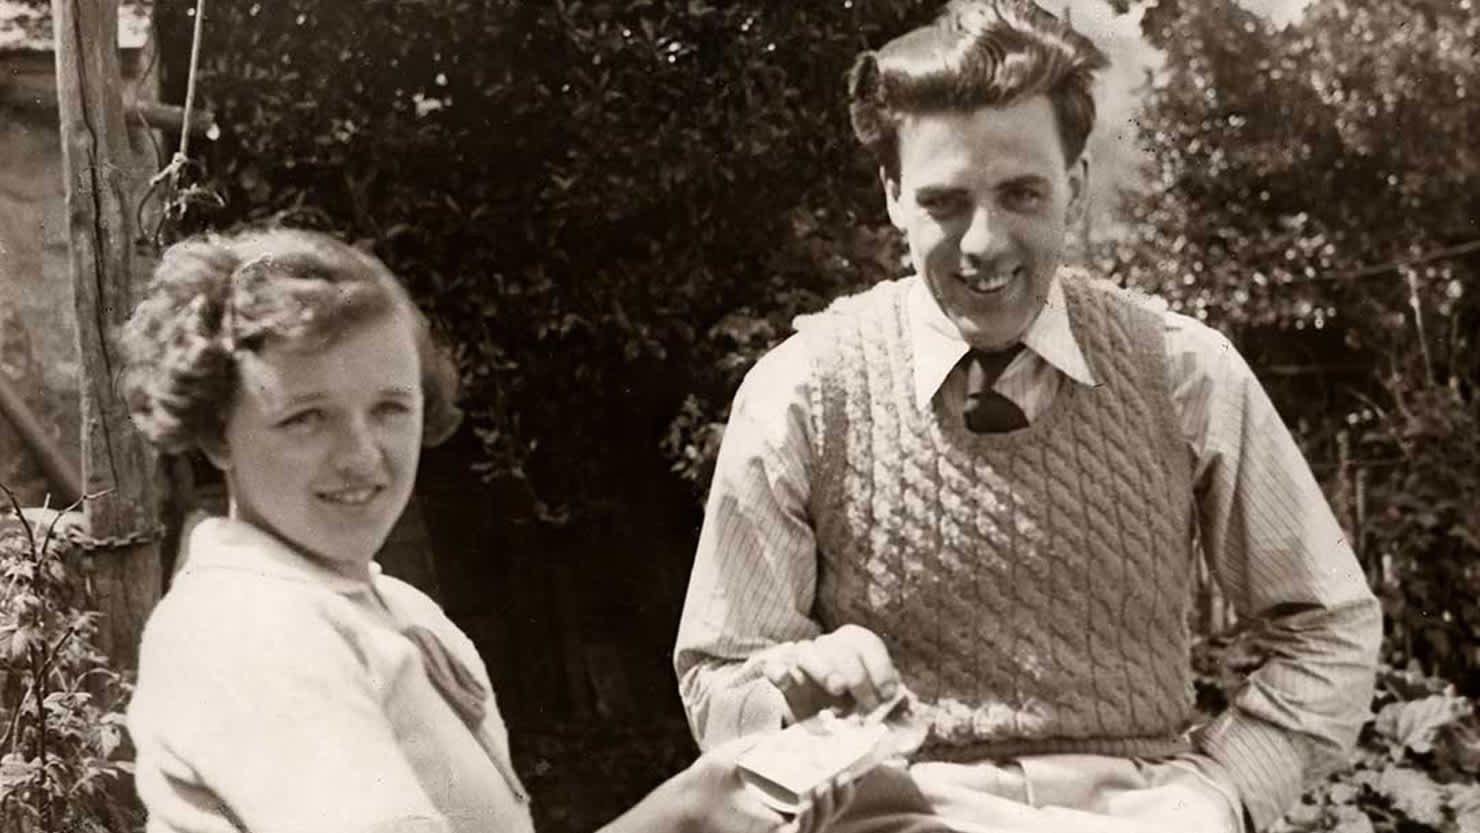 The Box | In my true element: Mark Weston (1905-1978)